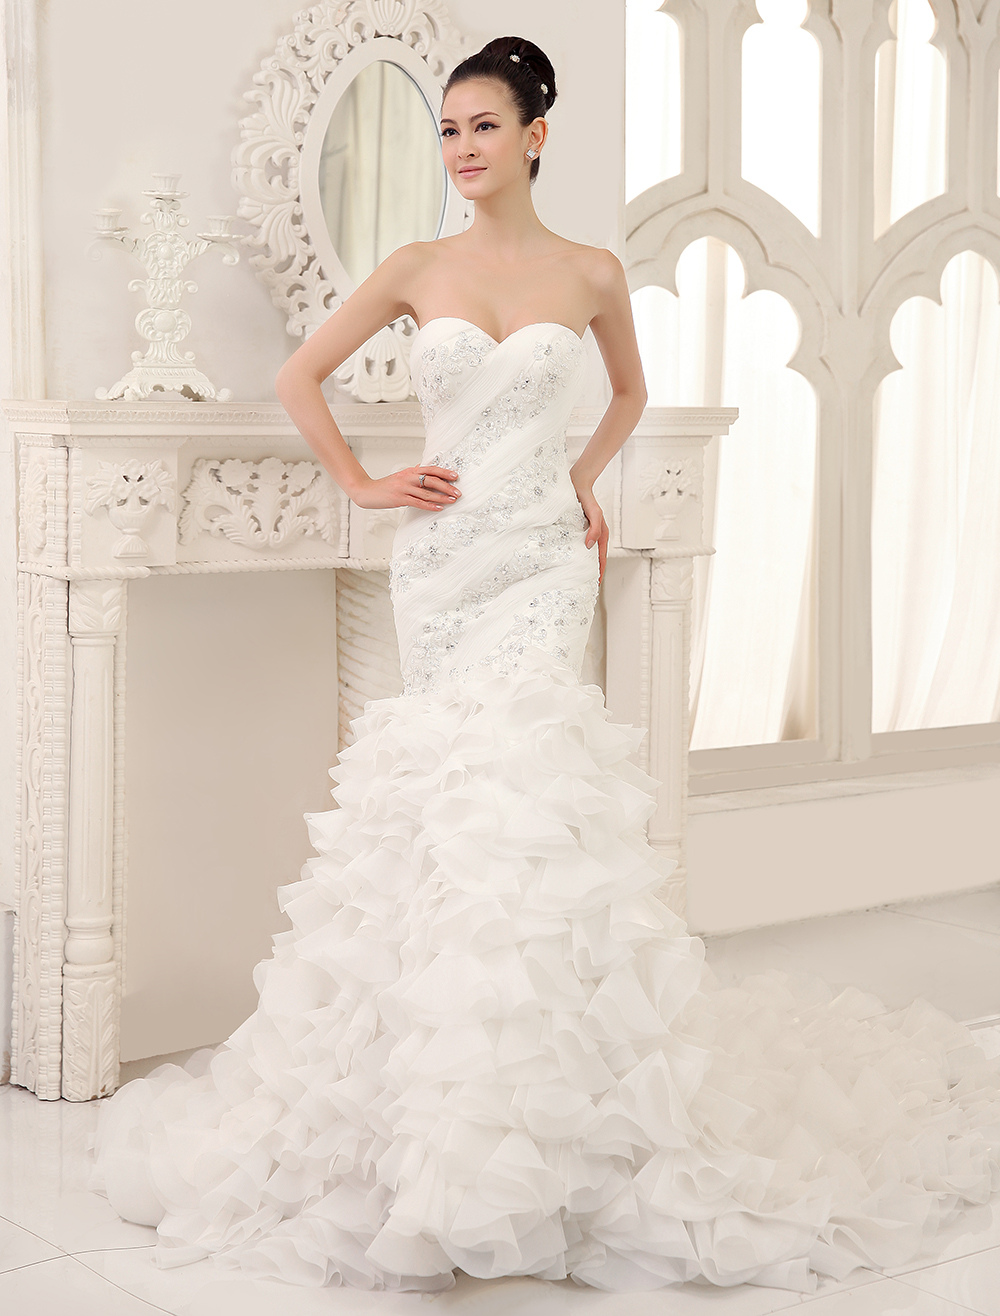 Ivory Glamorous Mermaid Organza Chapel Train Sweetheart Neck Wedding Dress with Applique